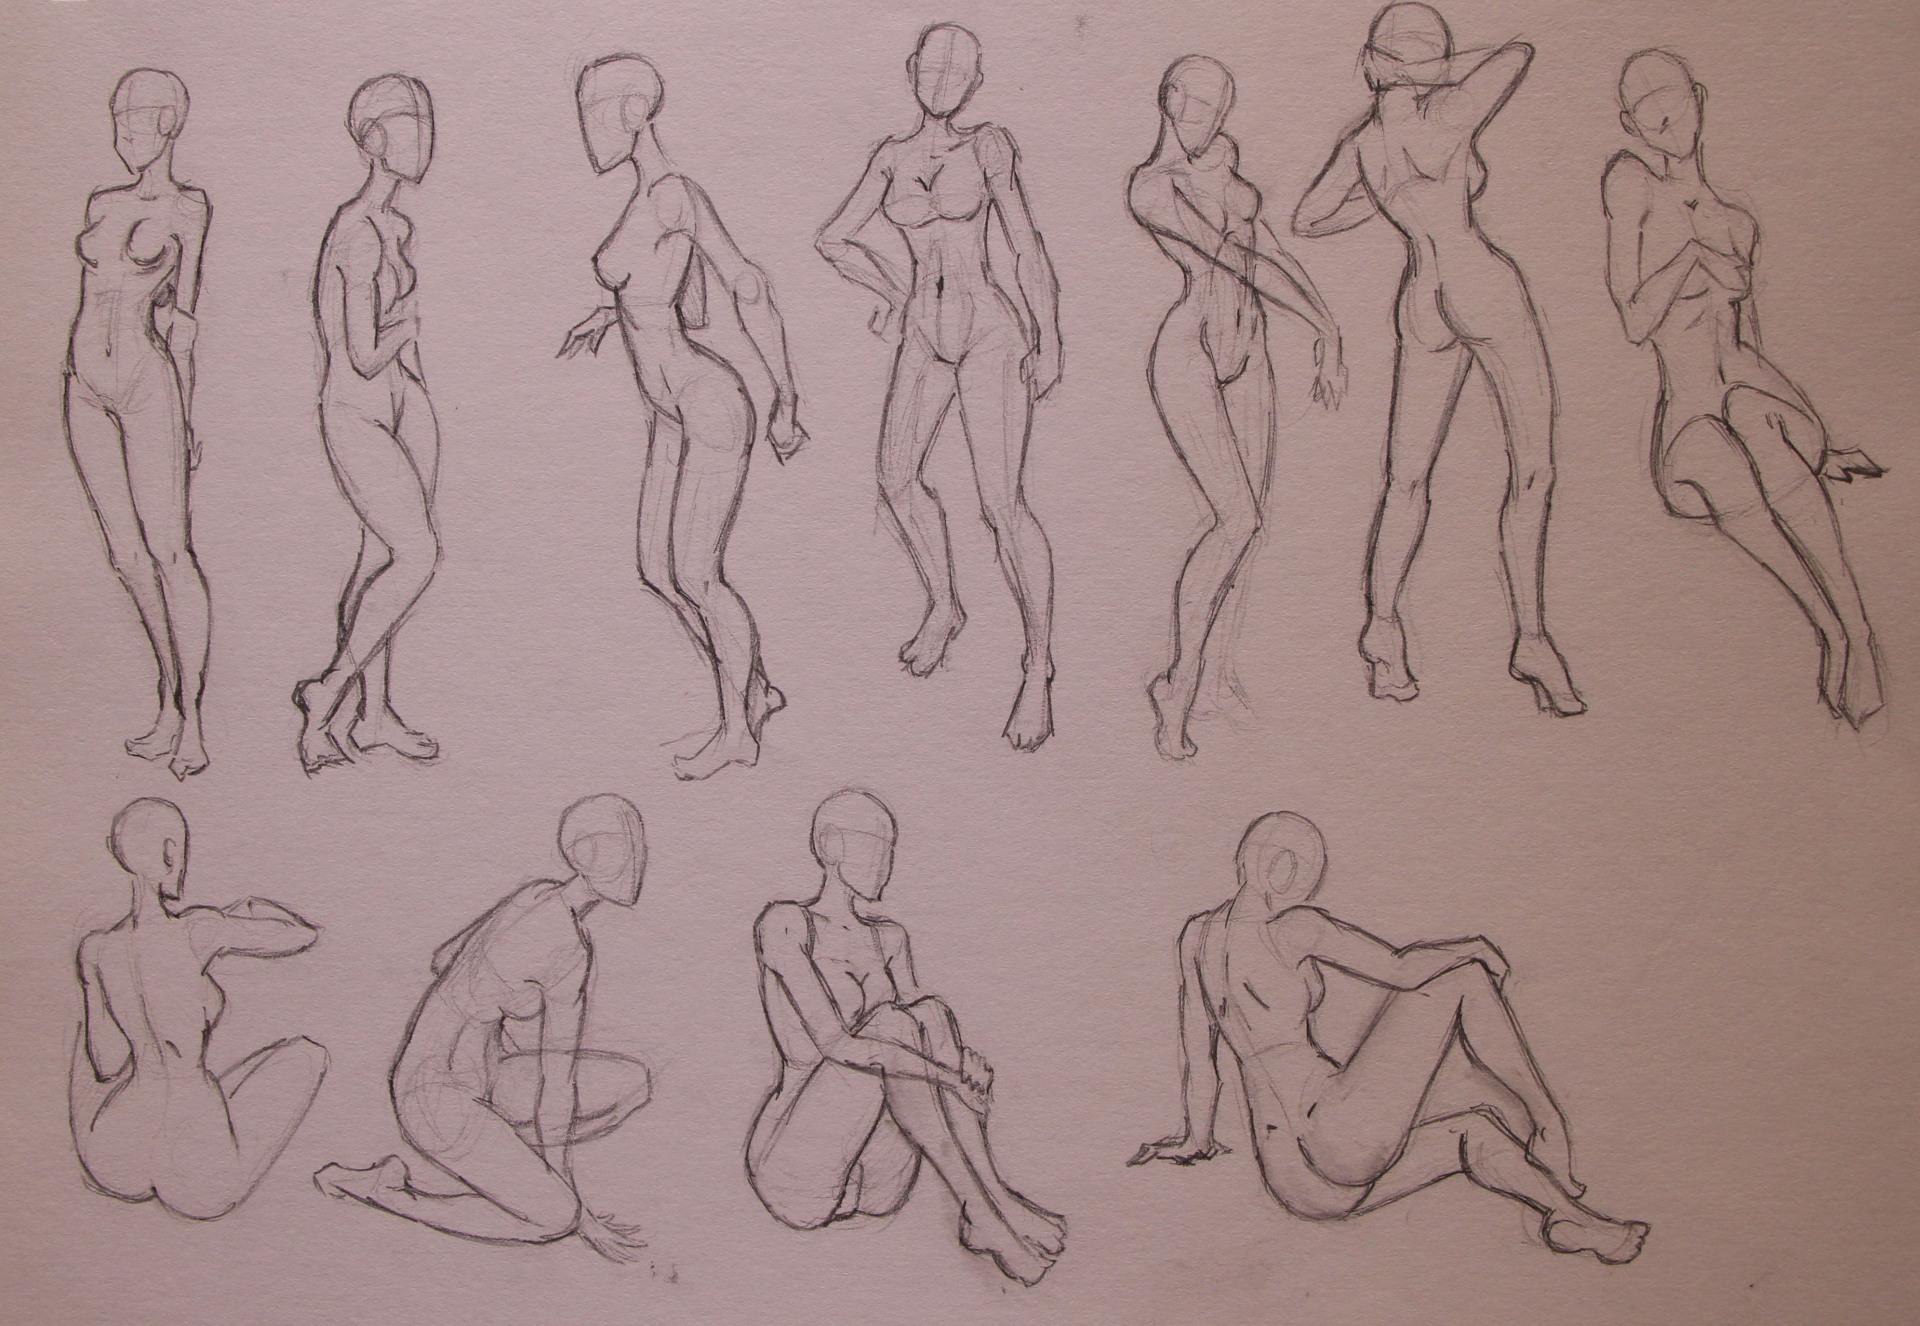 Anatomy Study - Female Poses